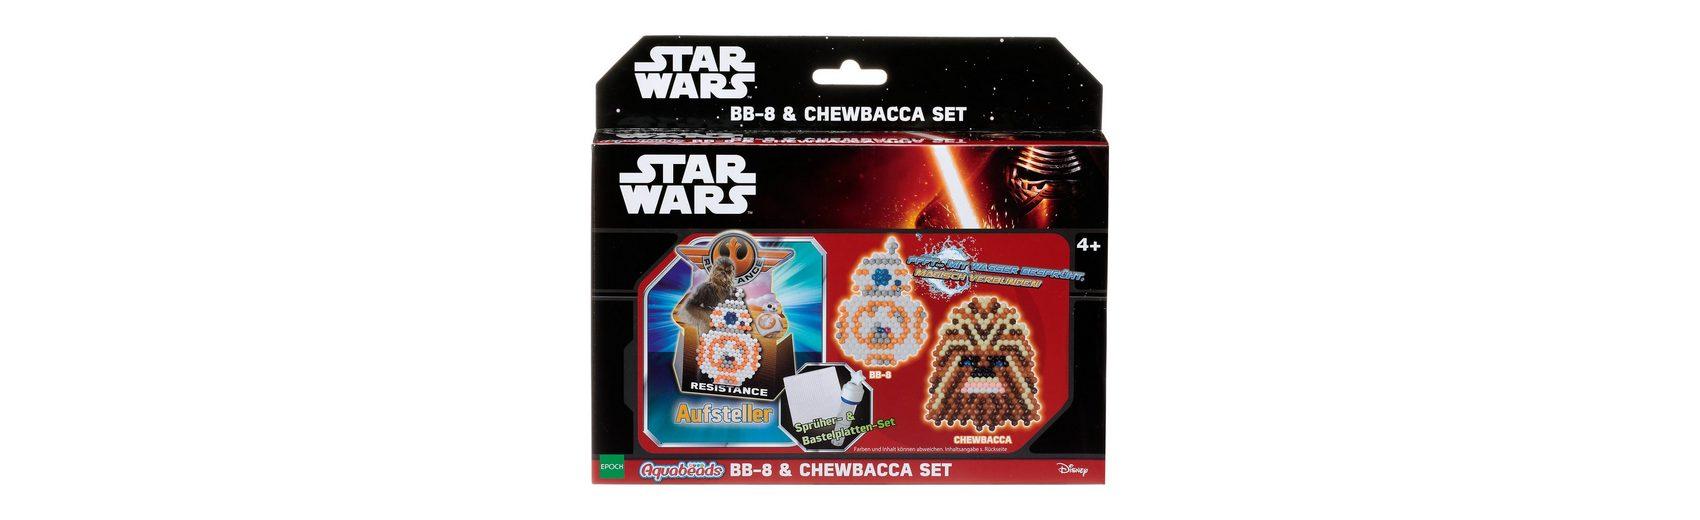 Epoch Traumwiesen Aquabeads Star Wars BB-8 & Chewbacca Set